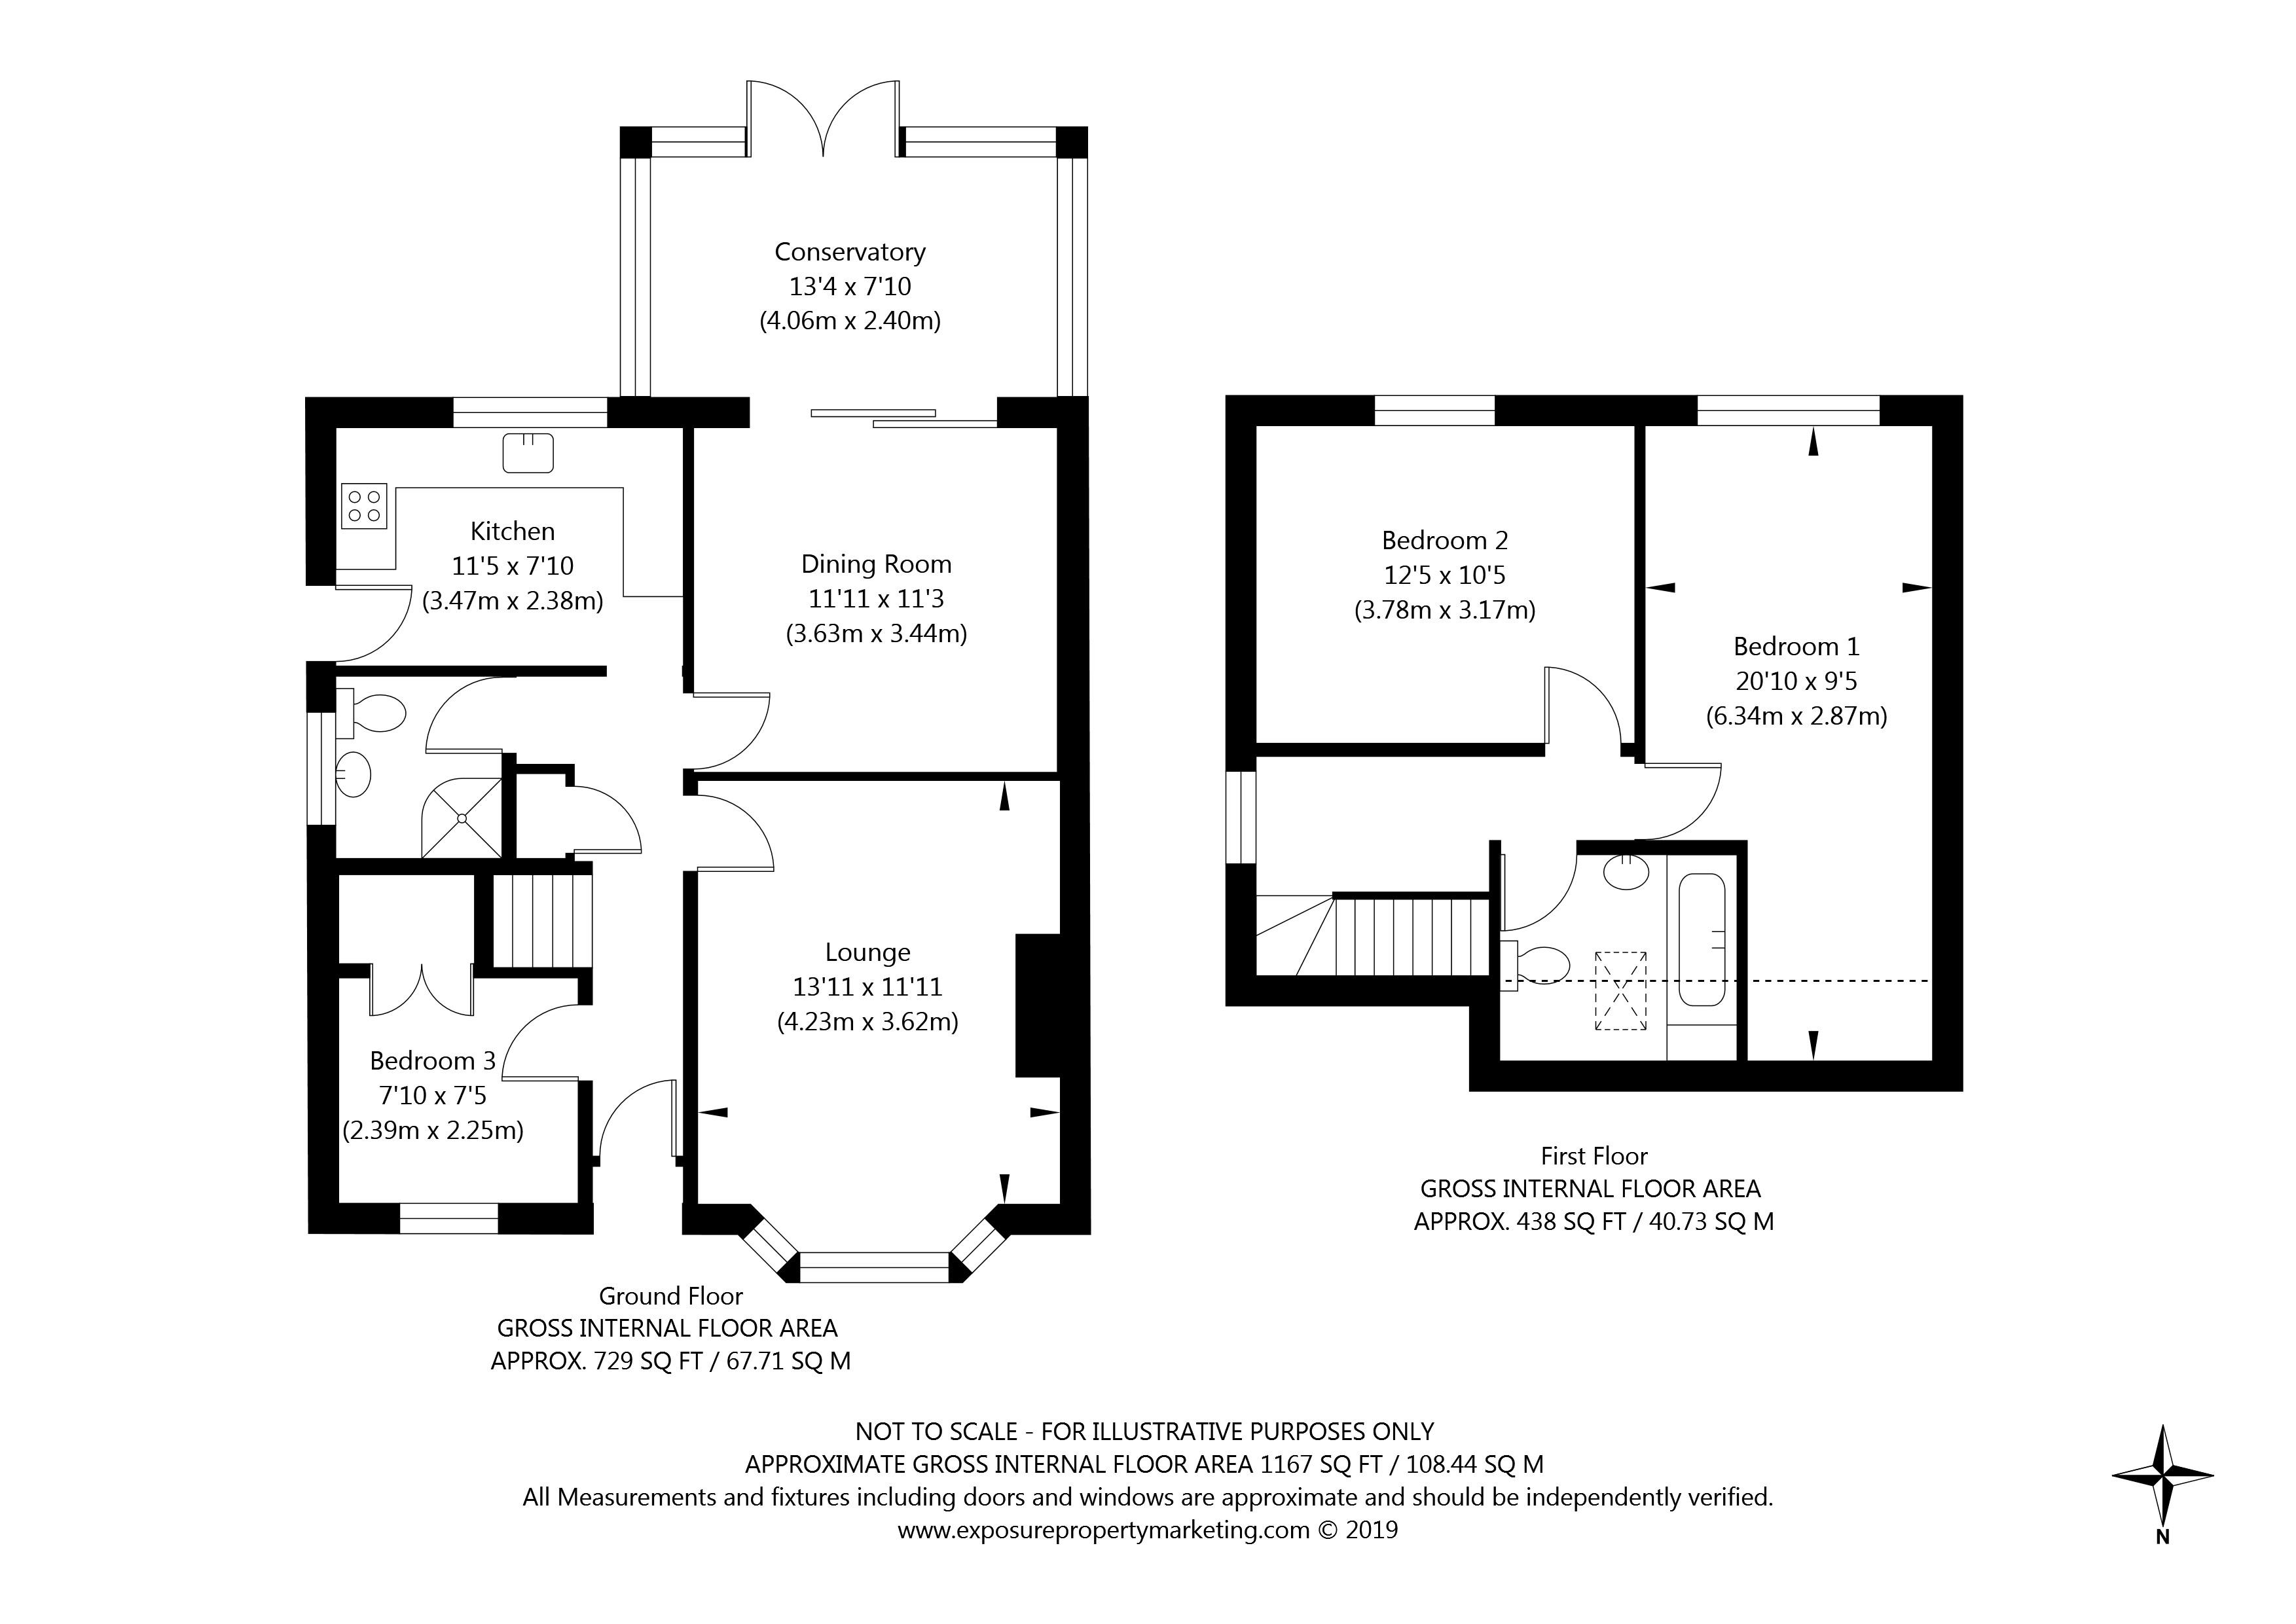 48 Broome Close, Huntington, York property floorplan